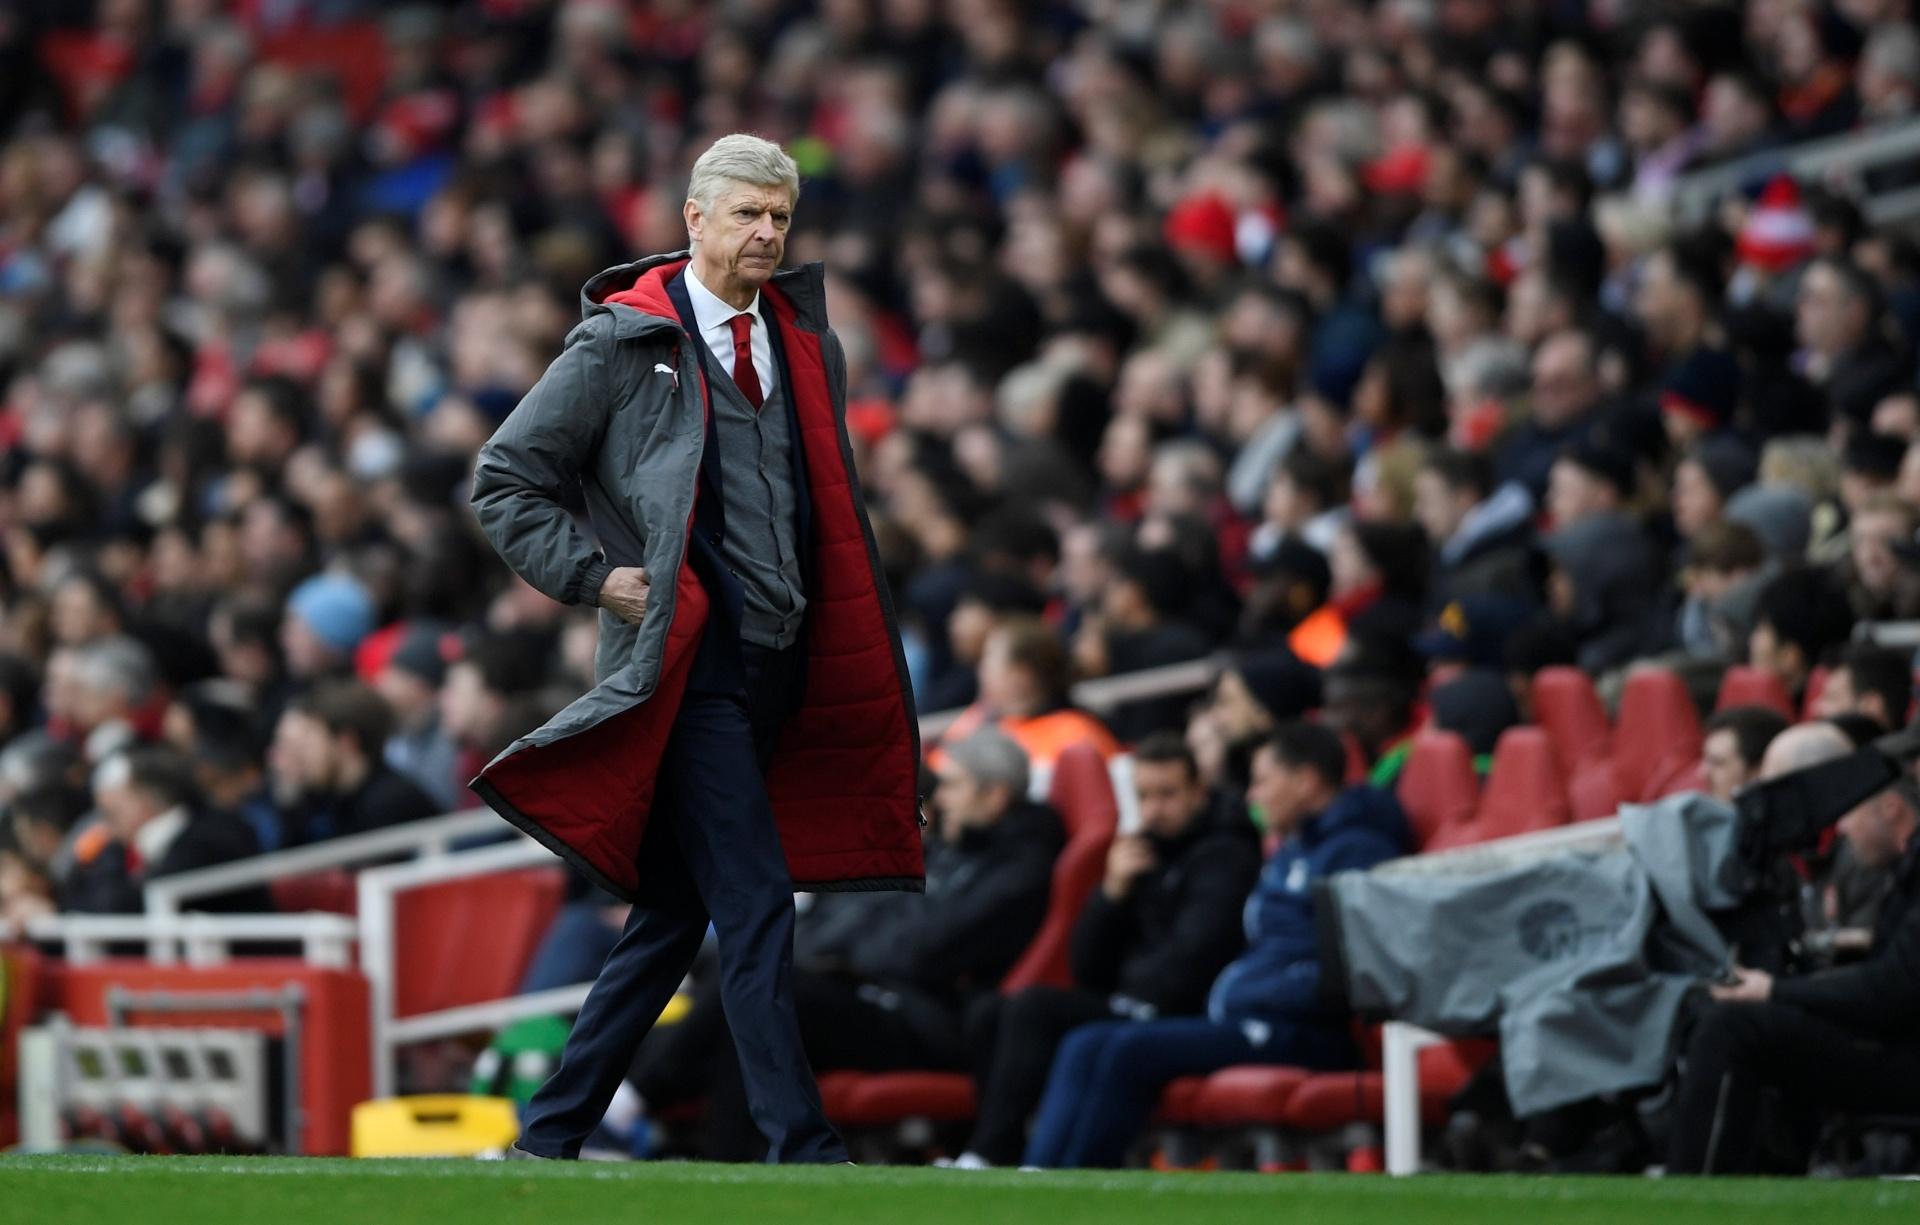 Wenger anuncia saída do Arsenal após 22 anos como técnico - 20 04 2018 -  UOL Esporte b03b2a6268cb7